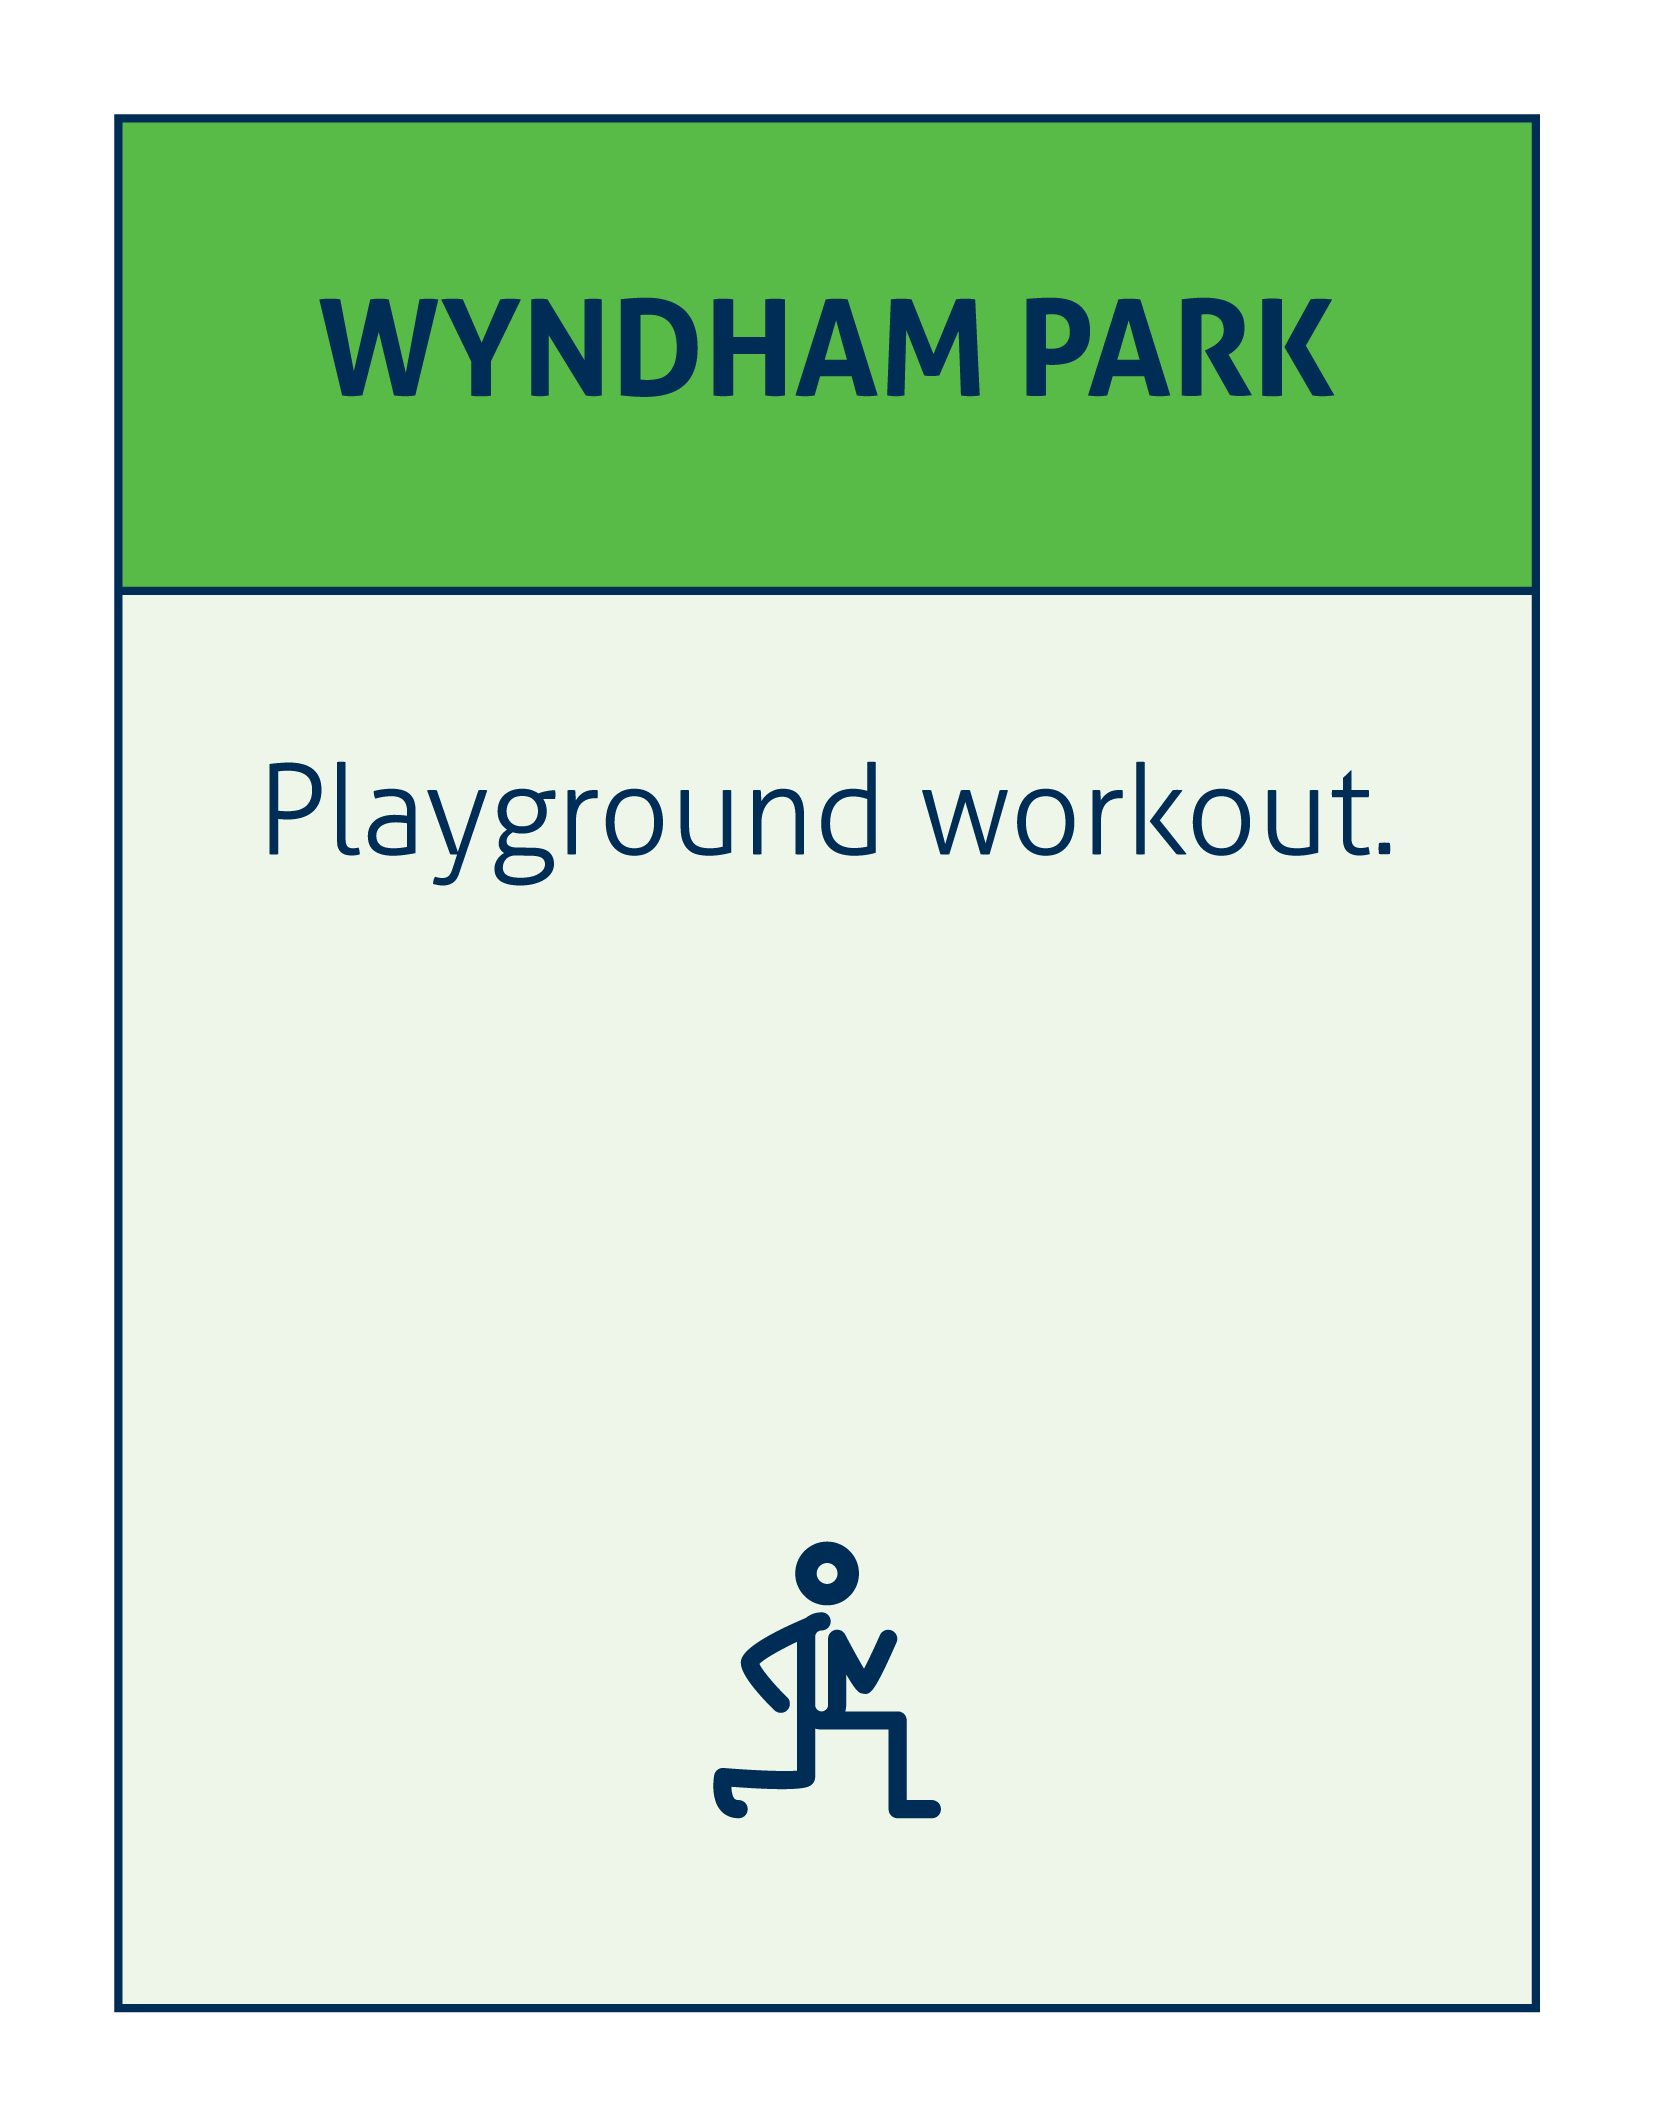 WLS0081_WynaOpoly_Board_IndividualSquares_v1_WyndhamPark[1]